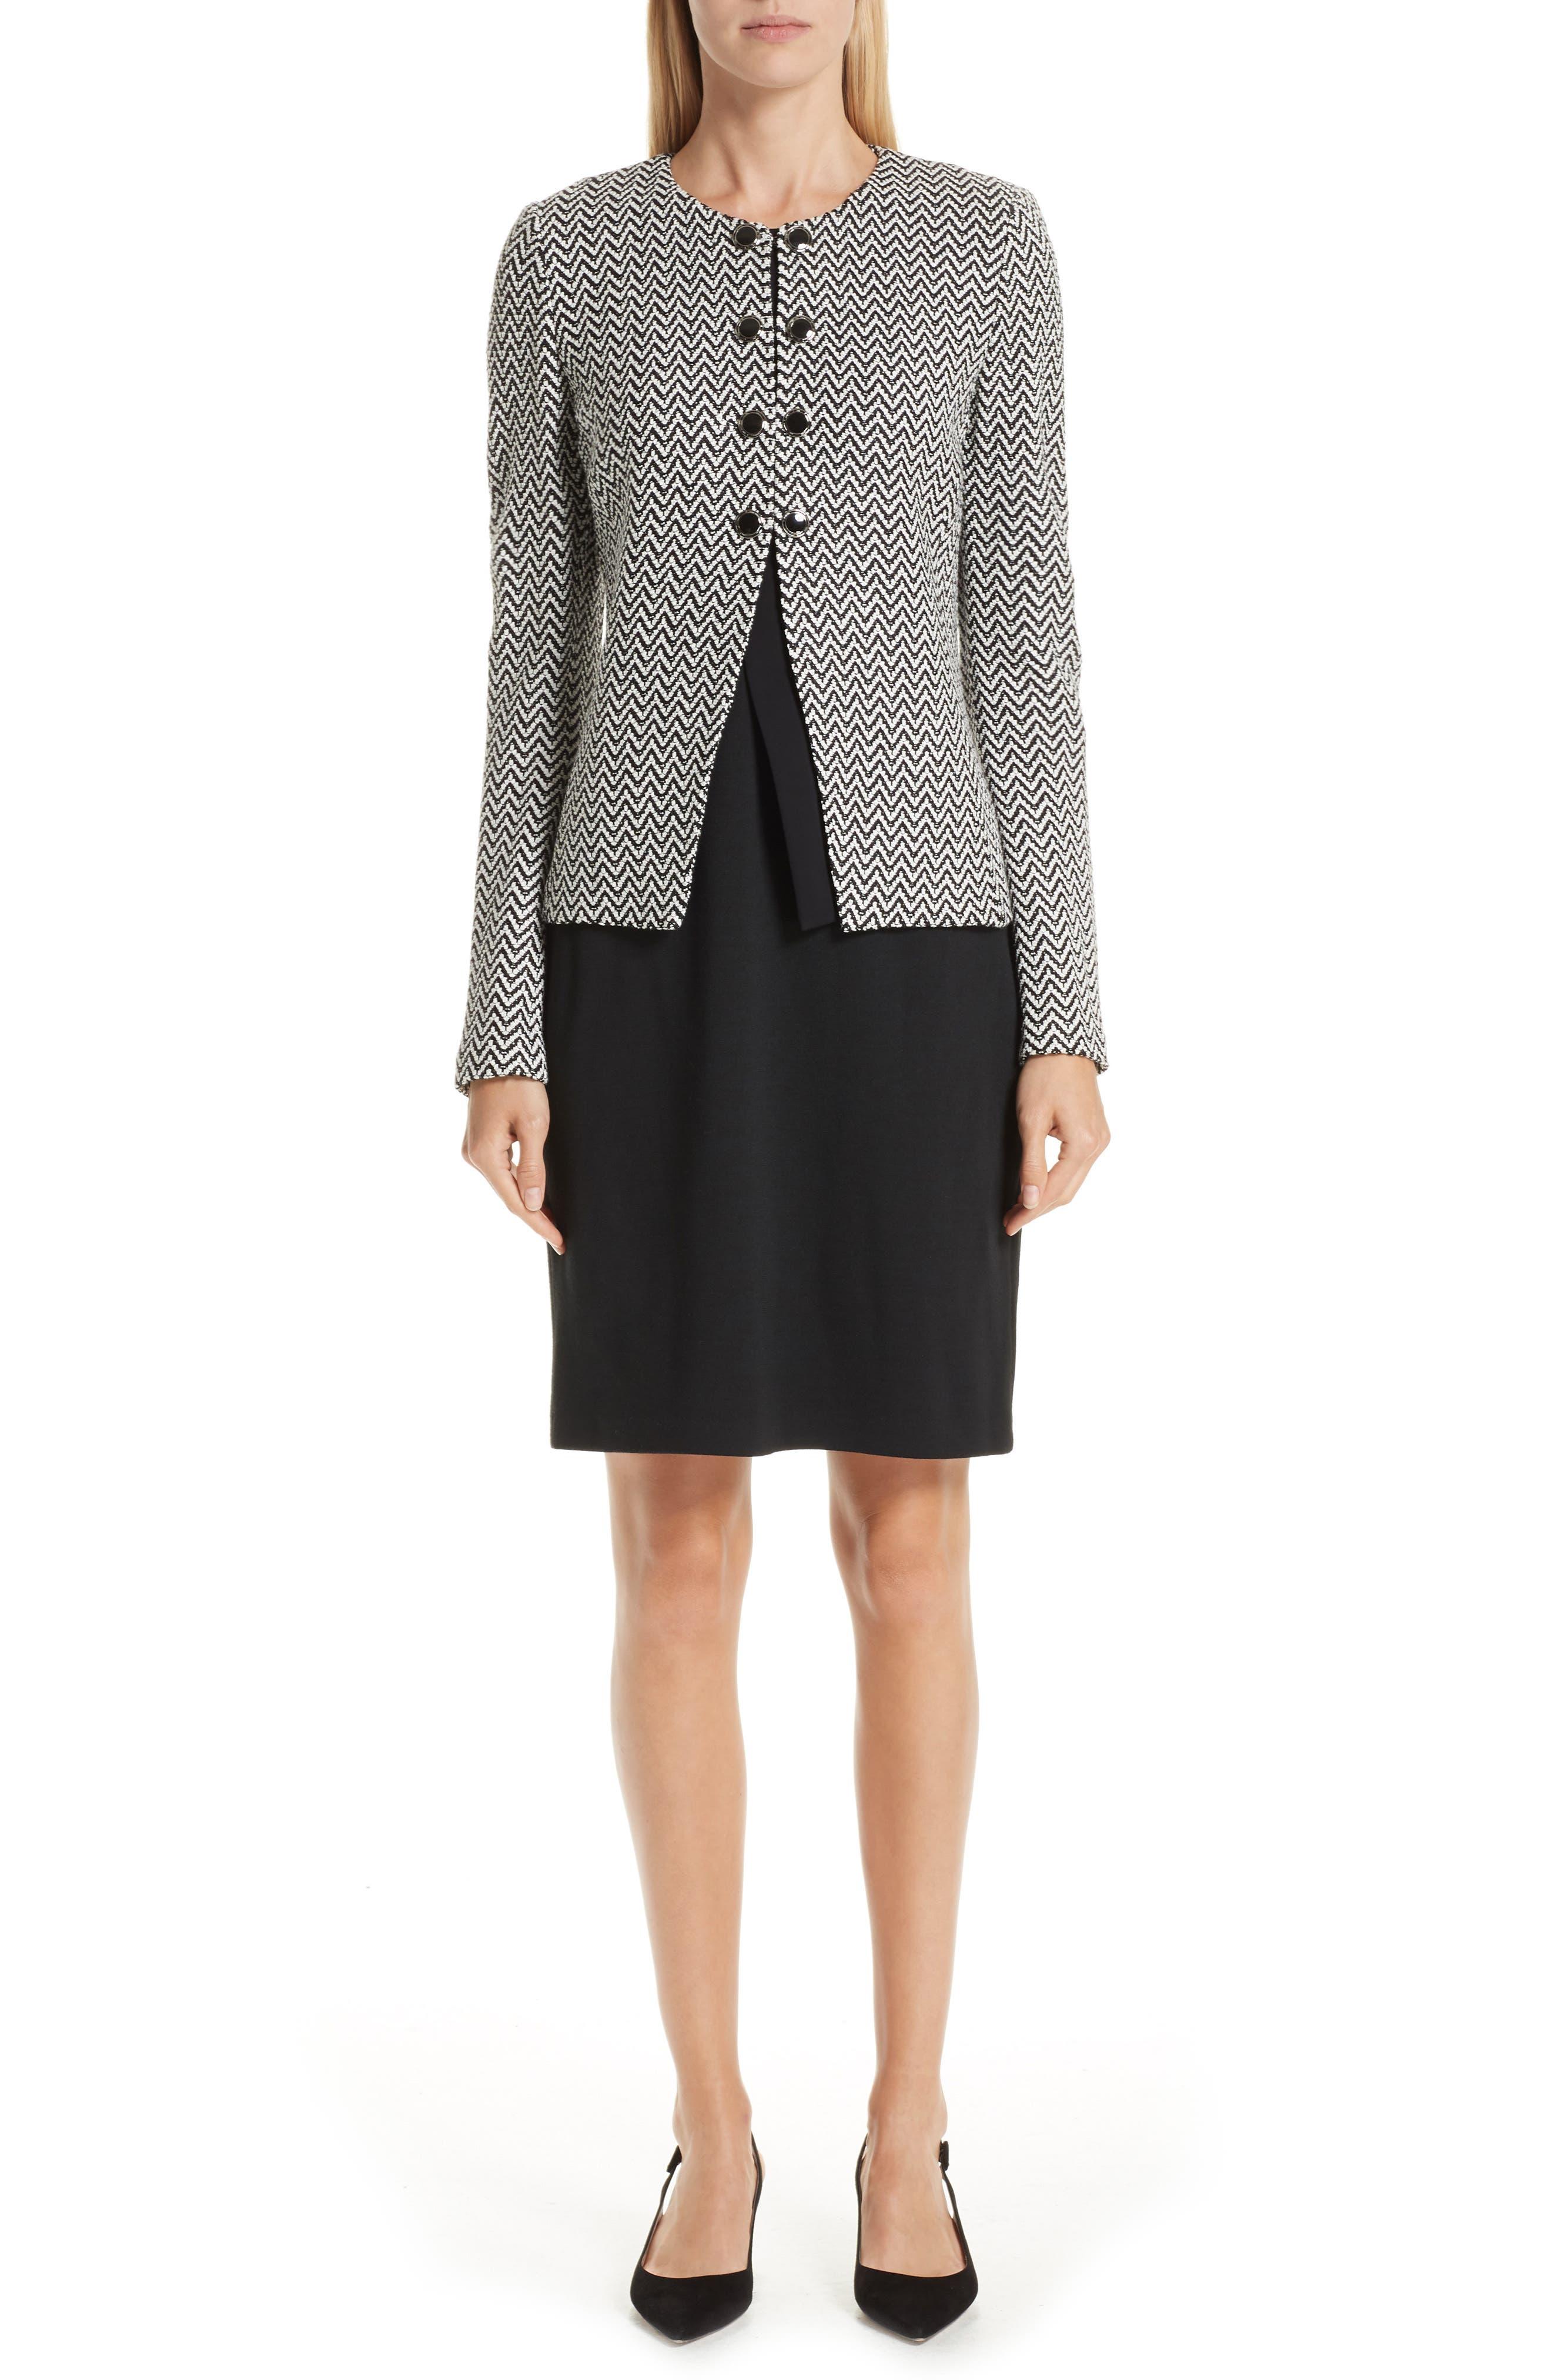 ST. JOHN COLLECTION, Milano Knit Sheath Dress, Alternate thumbnail 8, color, CAVIAR